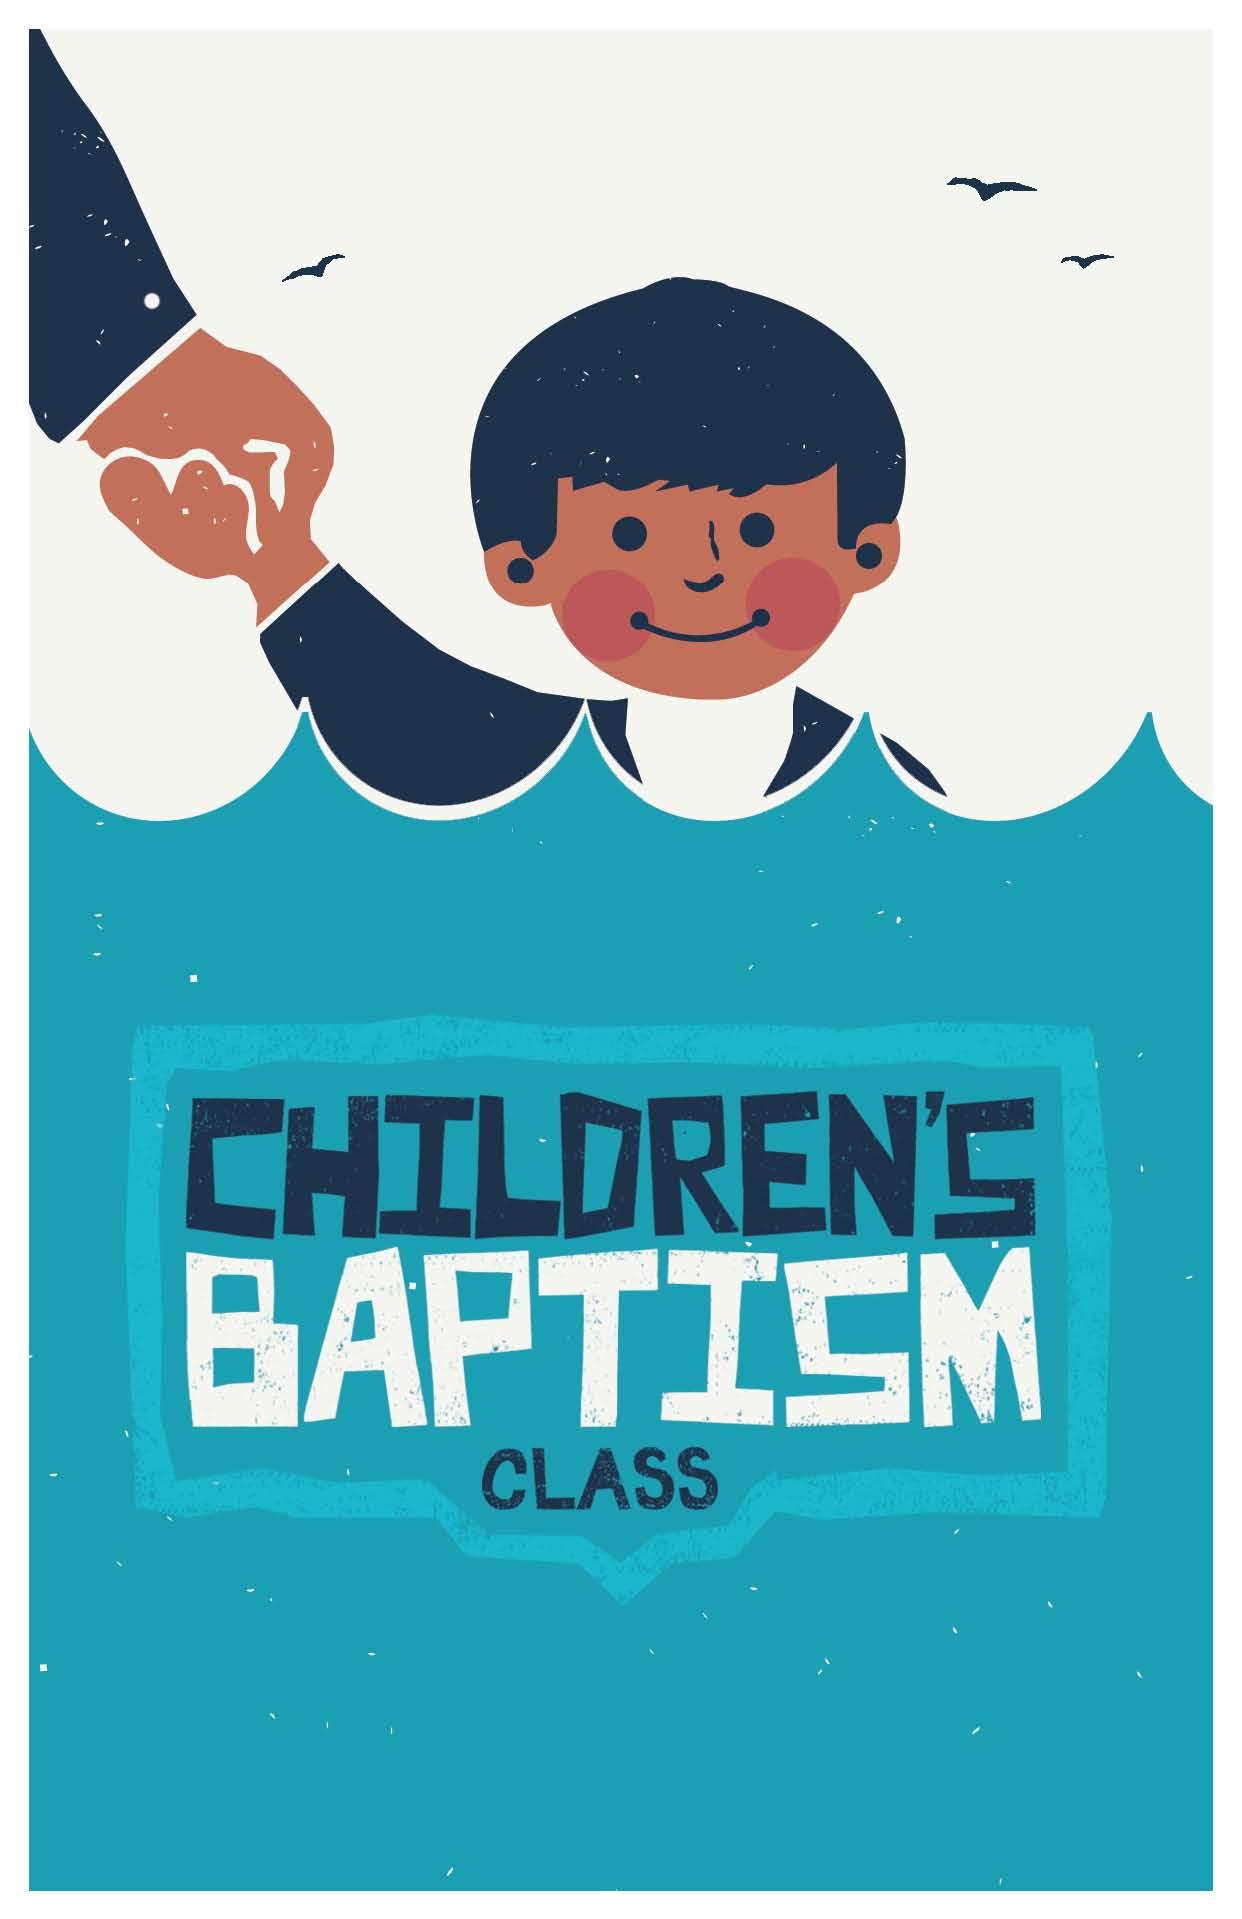 ChildBaptism_Poster__3_.jpg